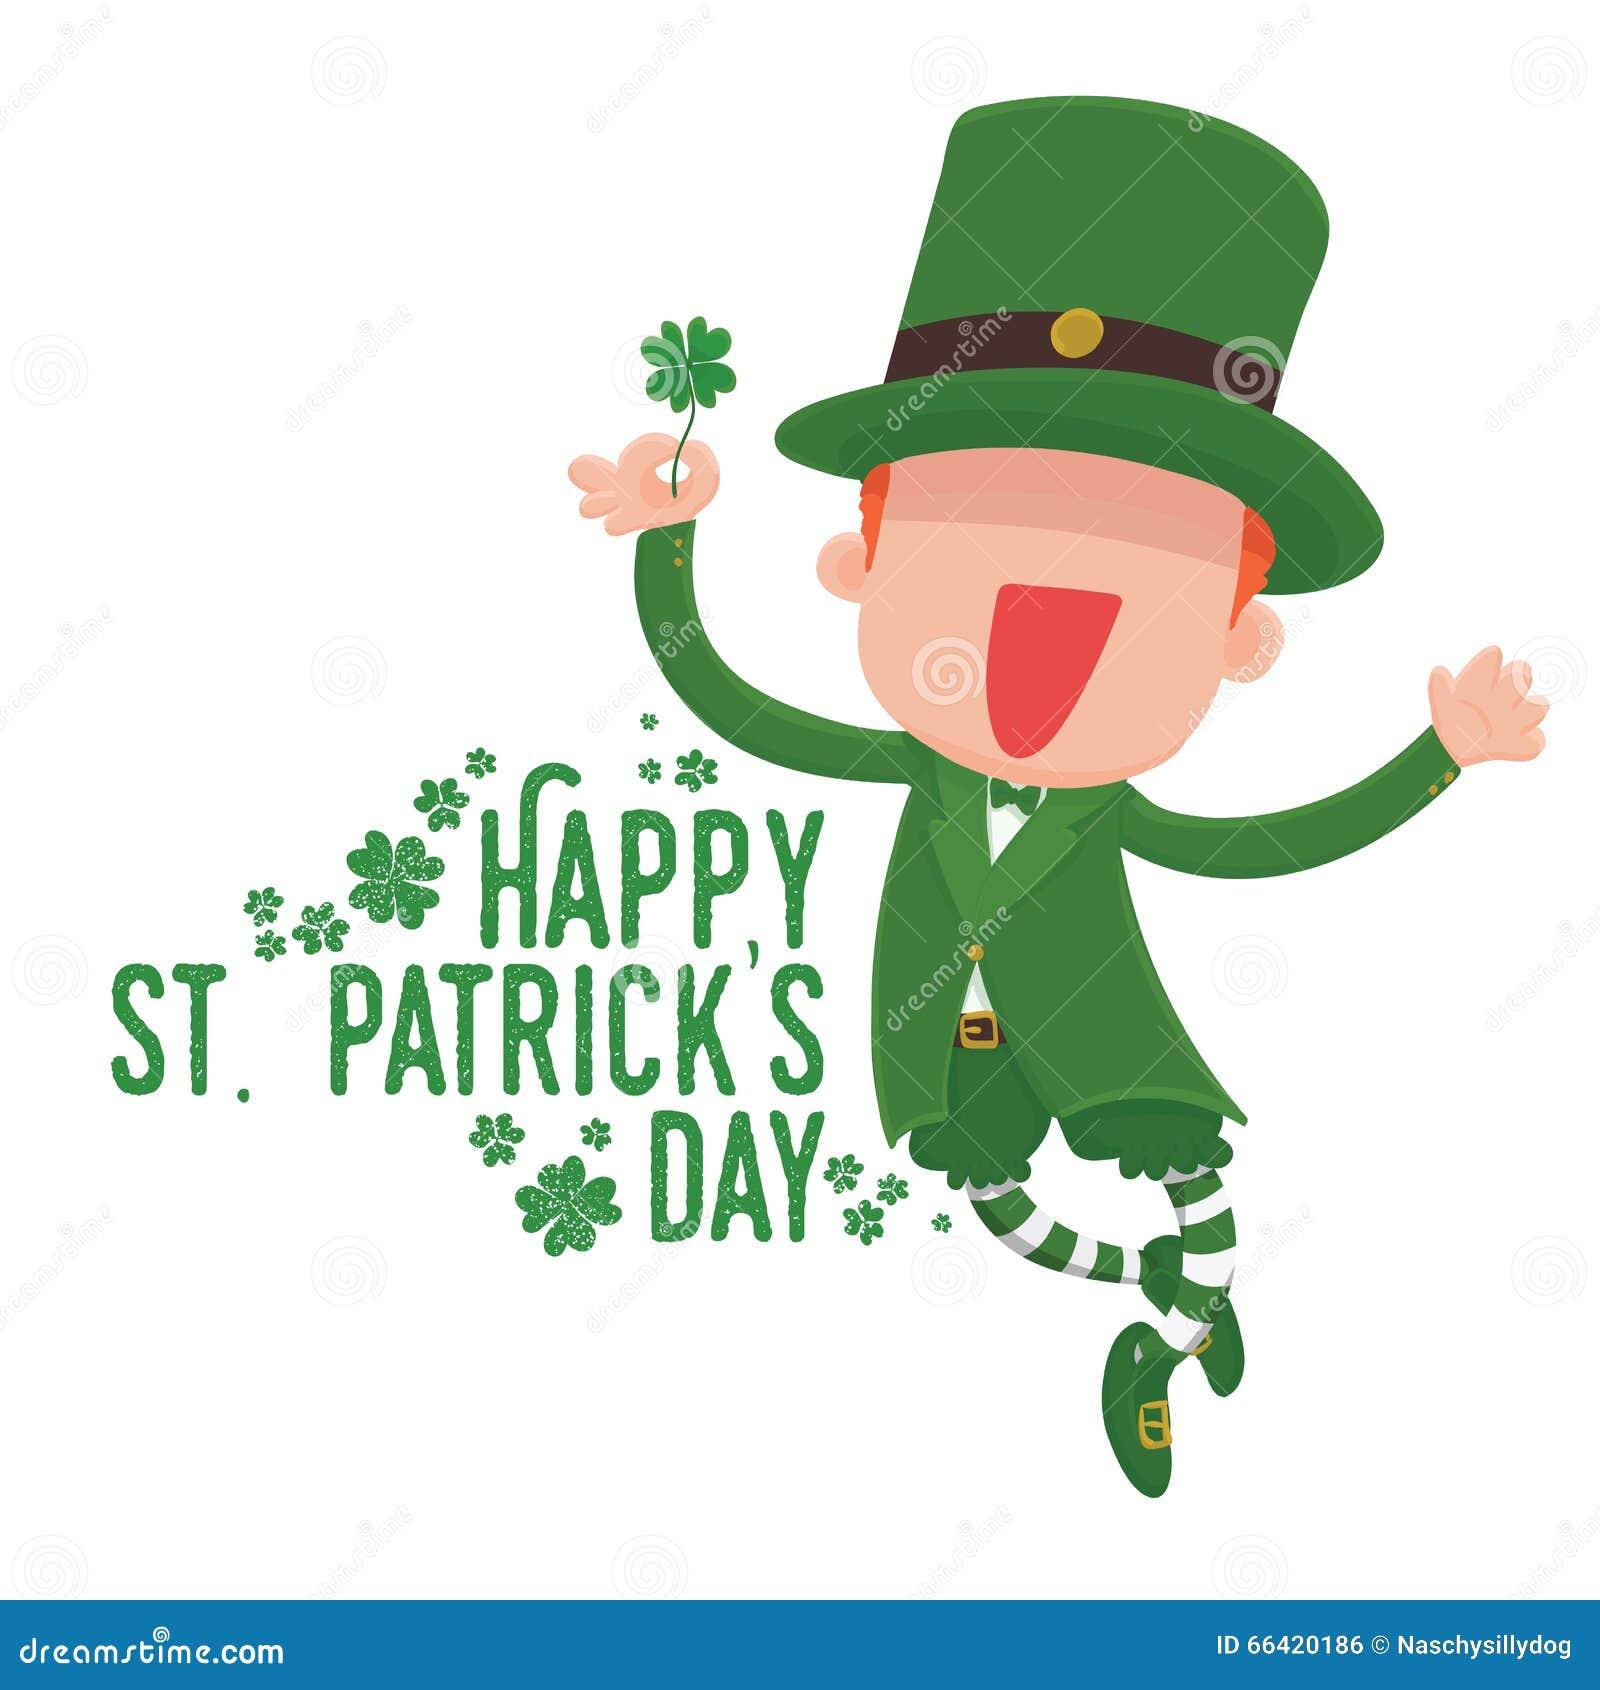 Leprechaun Holding A Four-Leaf Clover For St. Patrick's ...